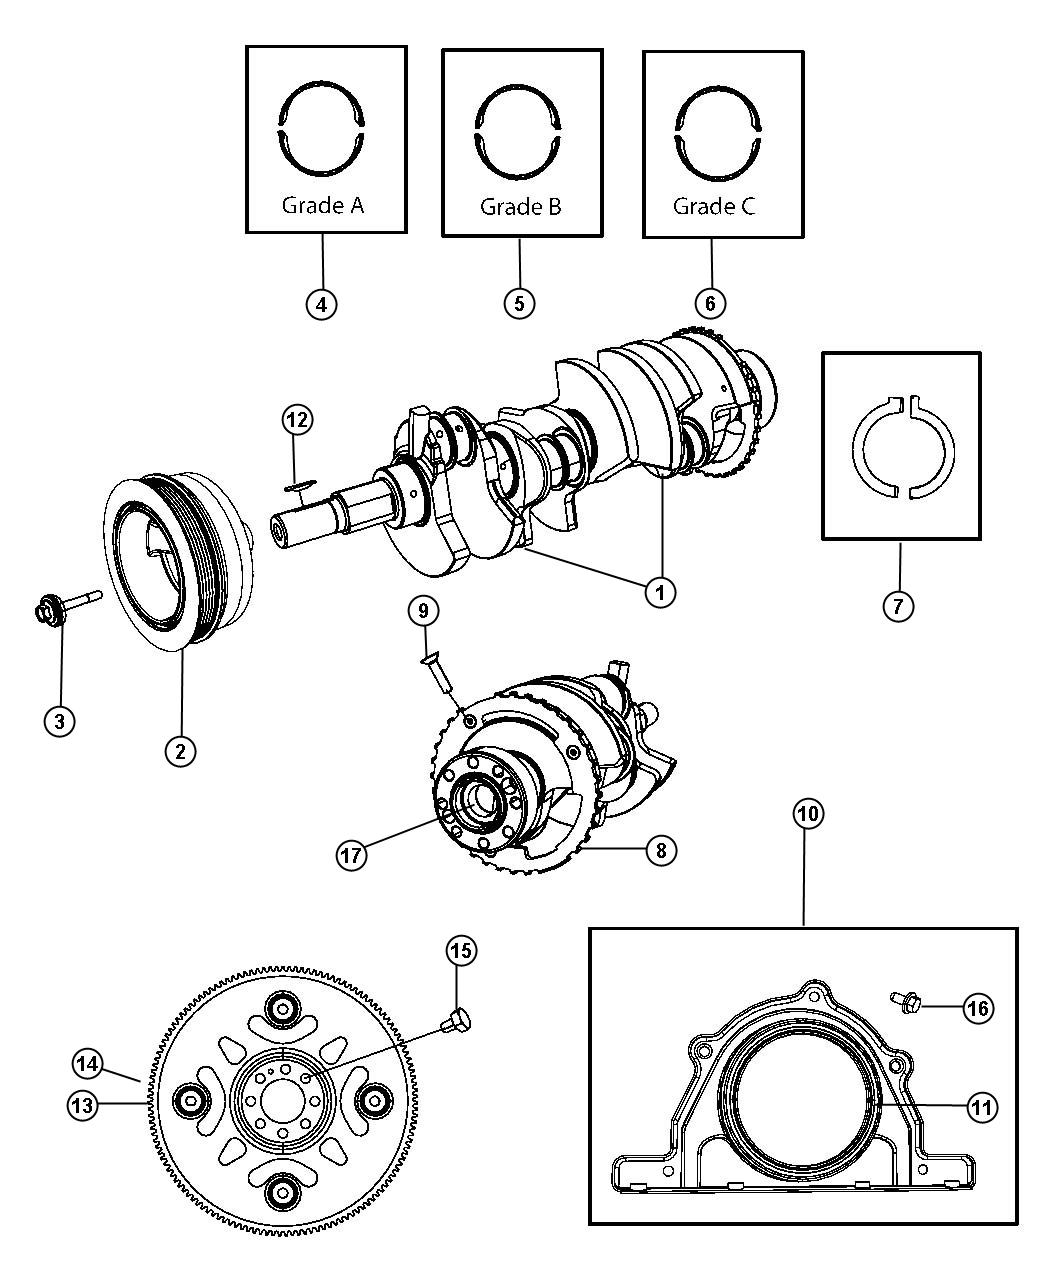 2003 Dodge Ram 2500 Crankshaft. Engine, hemi, torque